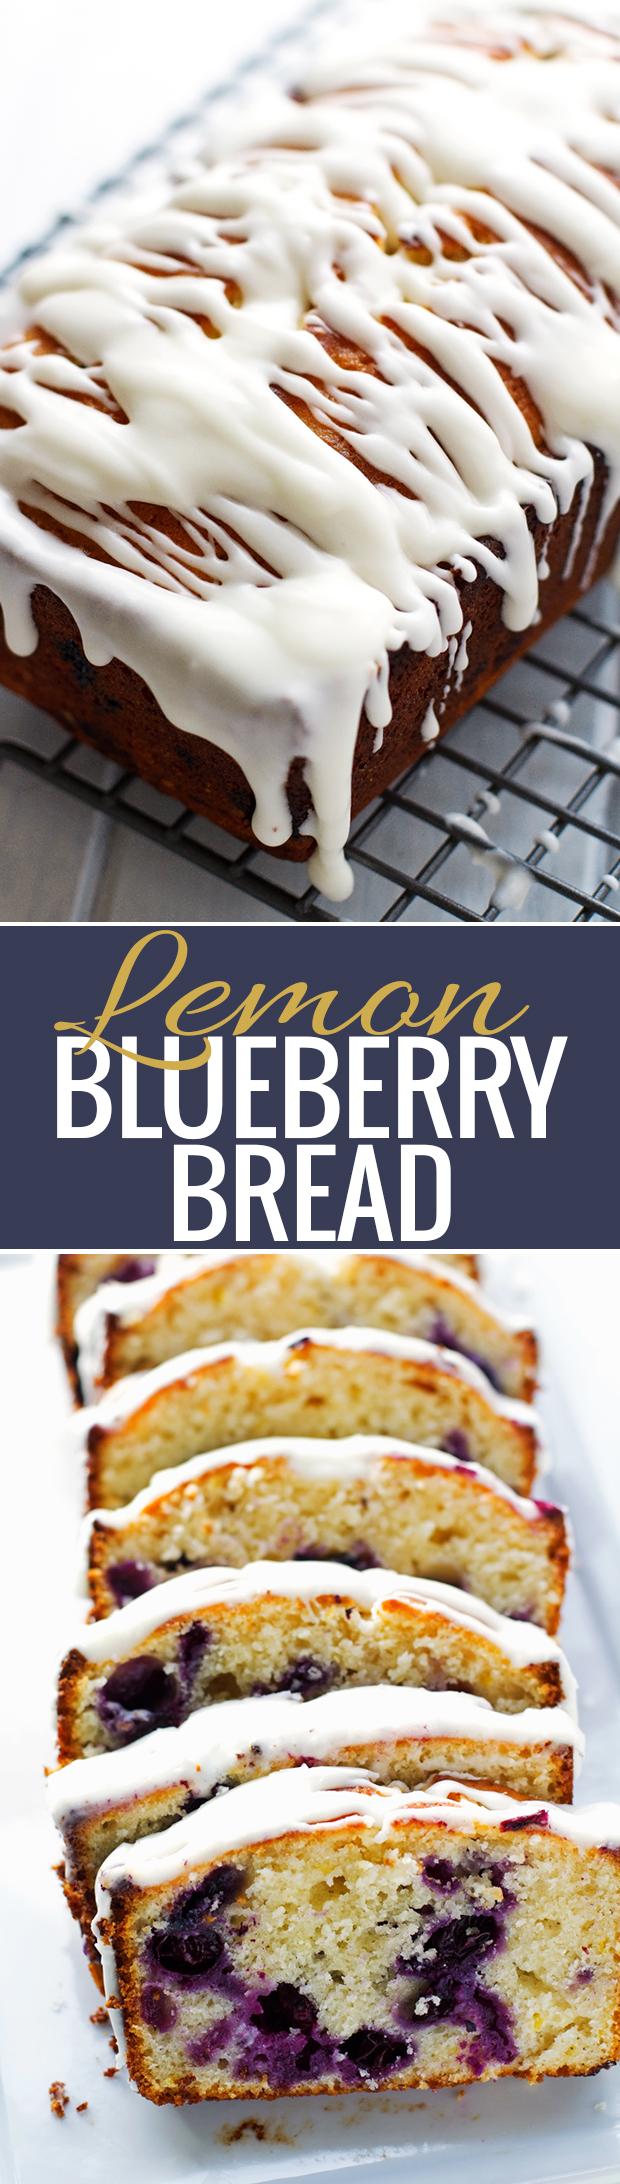 Lemon Blueberry Bread - A moist lemon poundcake studded with fresh juicy and plump blueberries! #blueberrybread #blueberrycake #poundcake #lemoncake #lemonblueberrycake | Littlespicejar.com